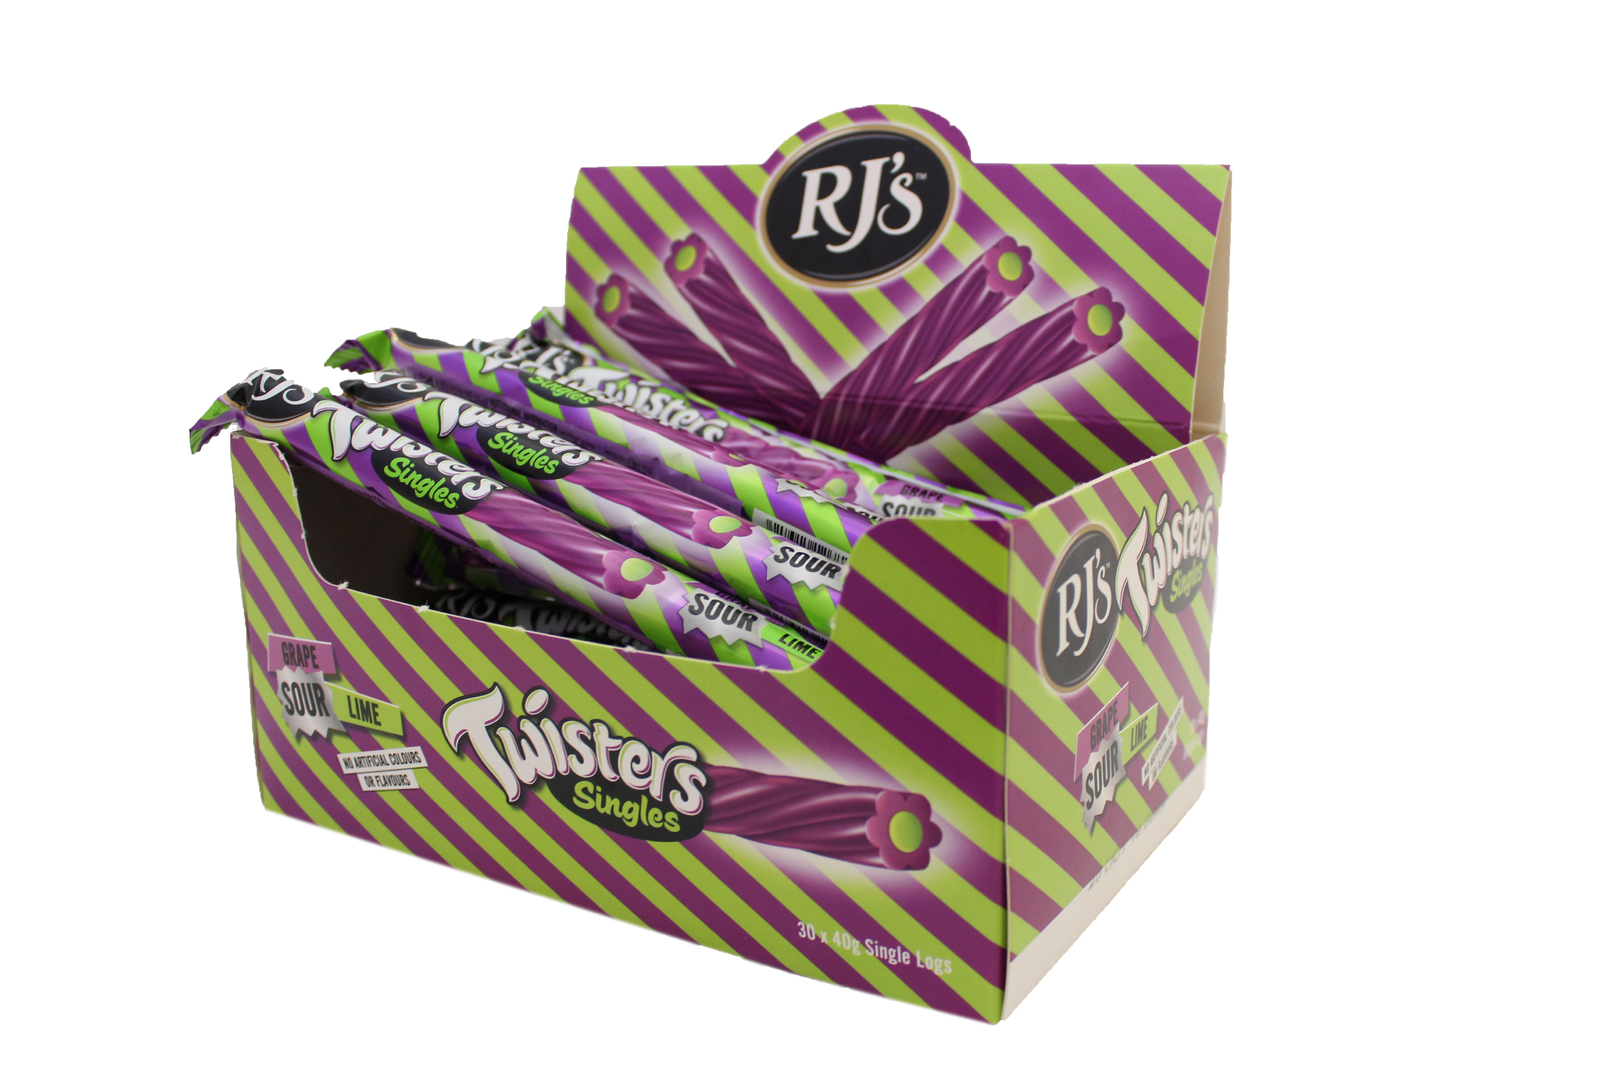 RJ's Fruity Twisters - Grape & Sour Lime Logs (30 Pack) image